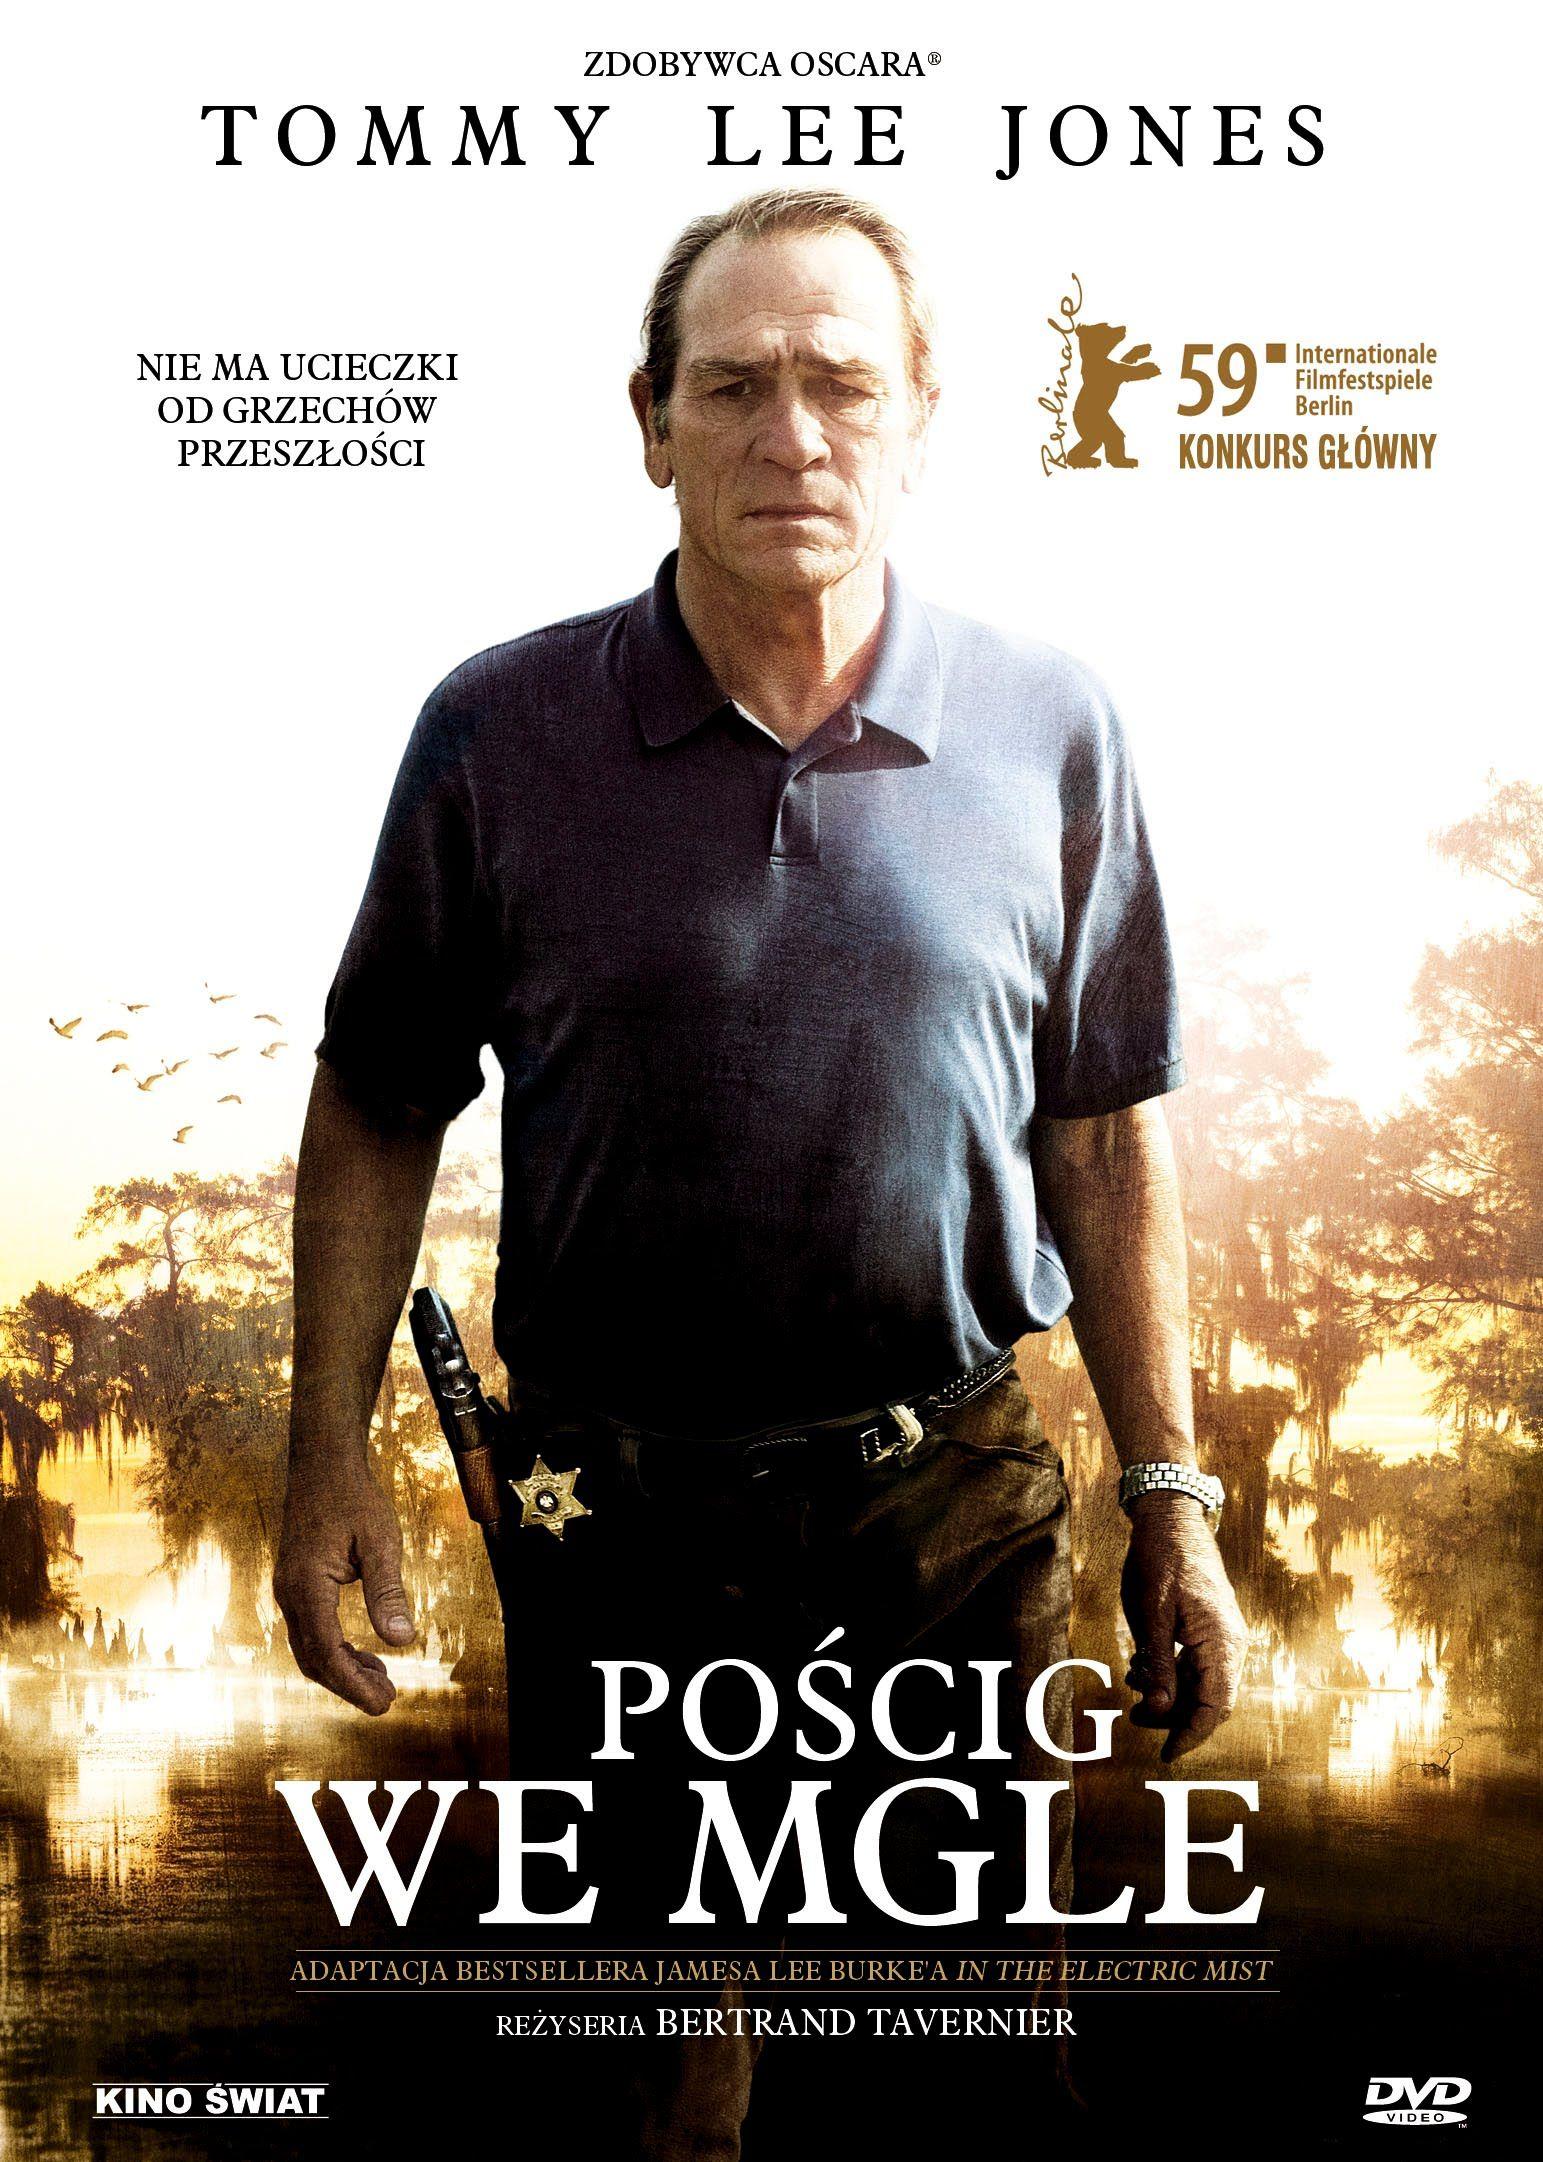 Poscig We Mgle 2009 In The Electric Mist Caly Film Lektor Pl